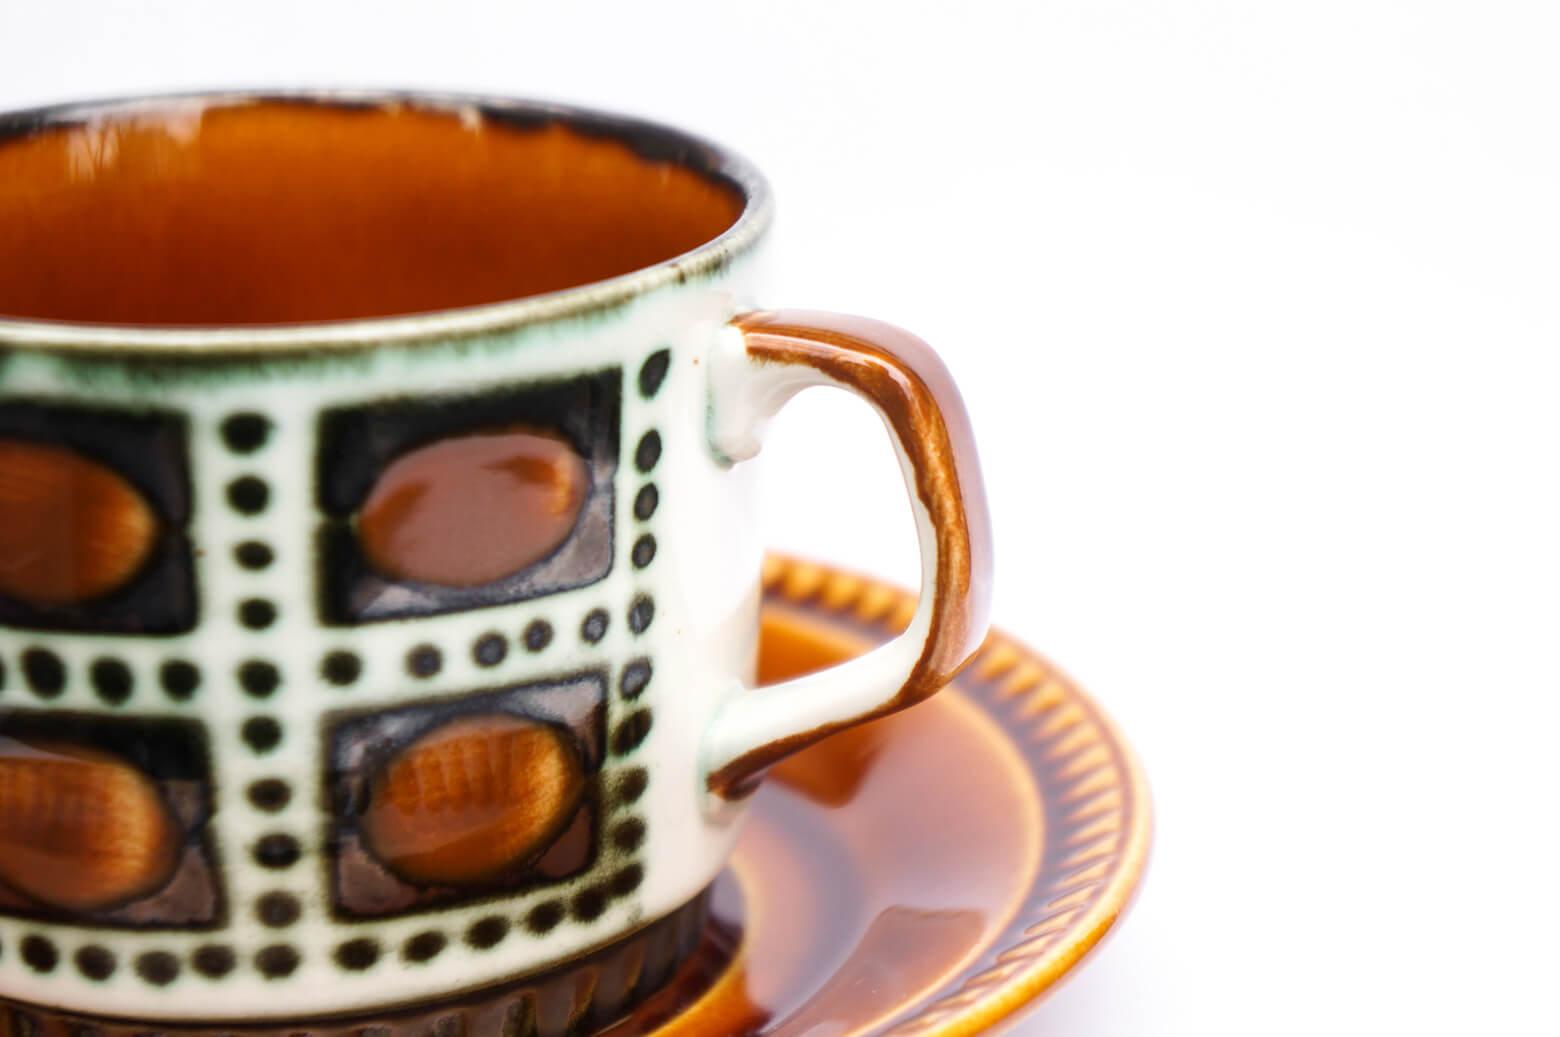 Boch Cup and Saucer Bernadette / ボッホ カップ アンド ソーサー ベルナデッタ ヴィンテージ 食器 ベルギー 雑貨 2